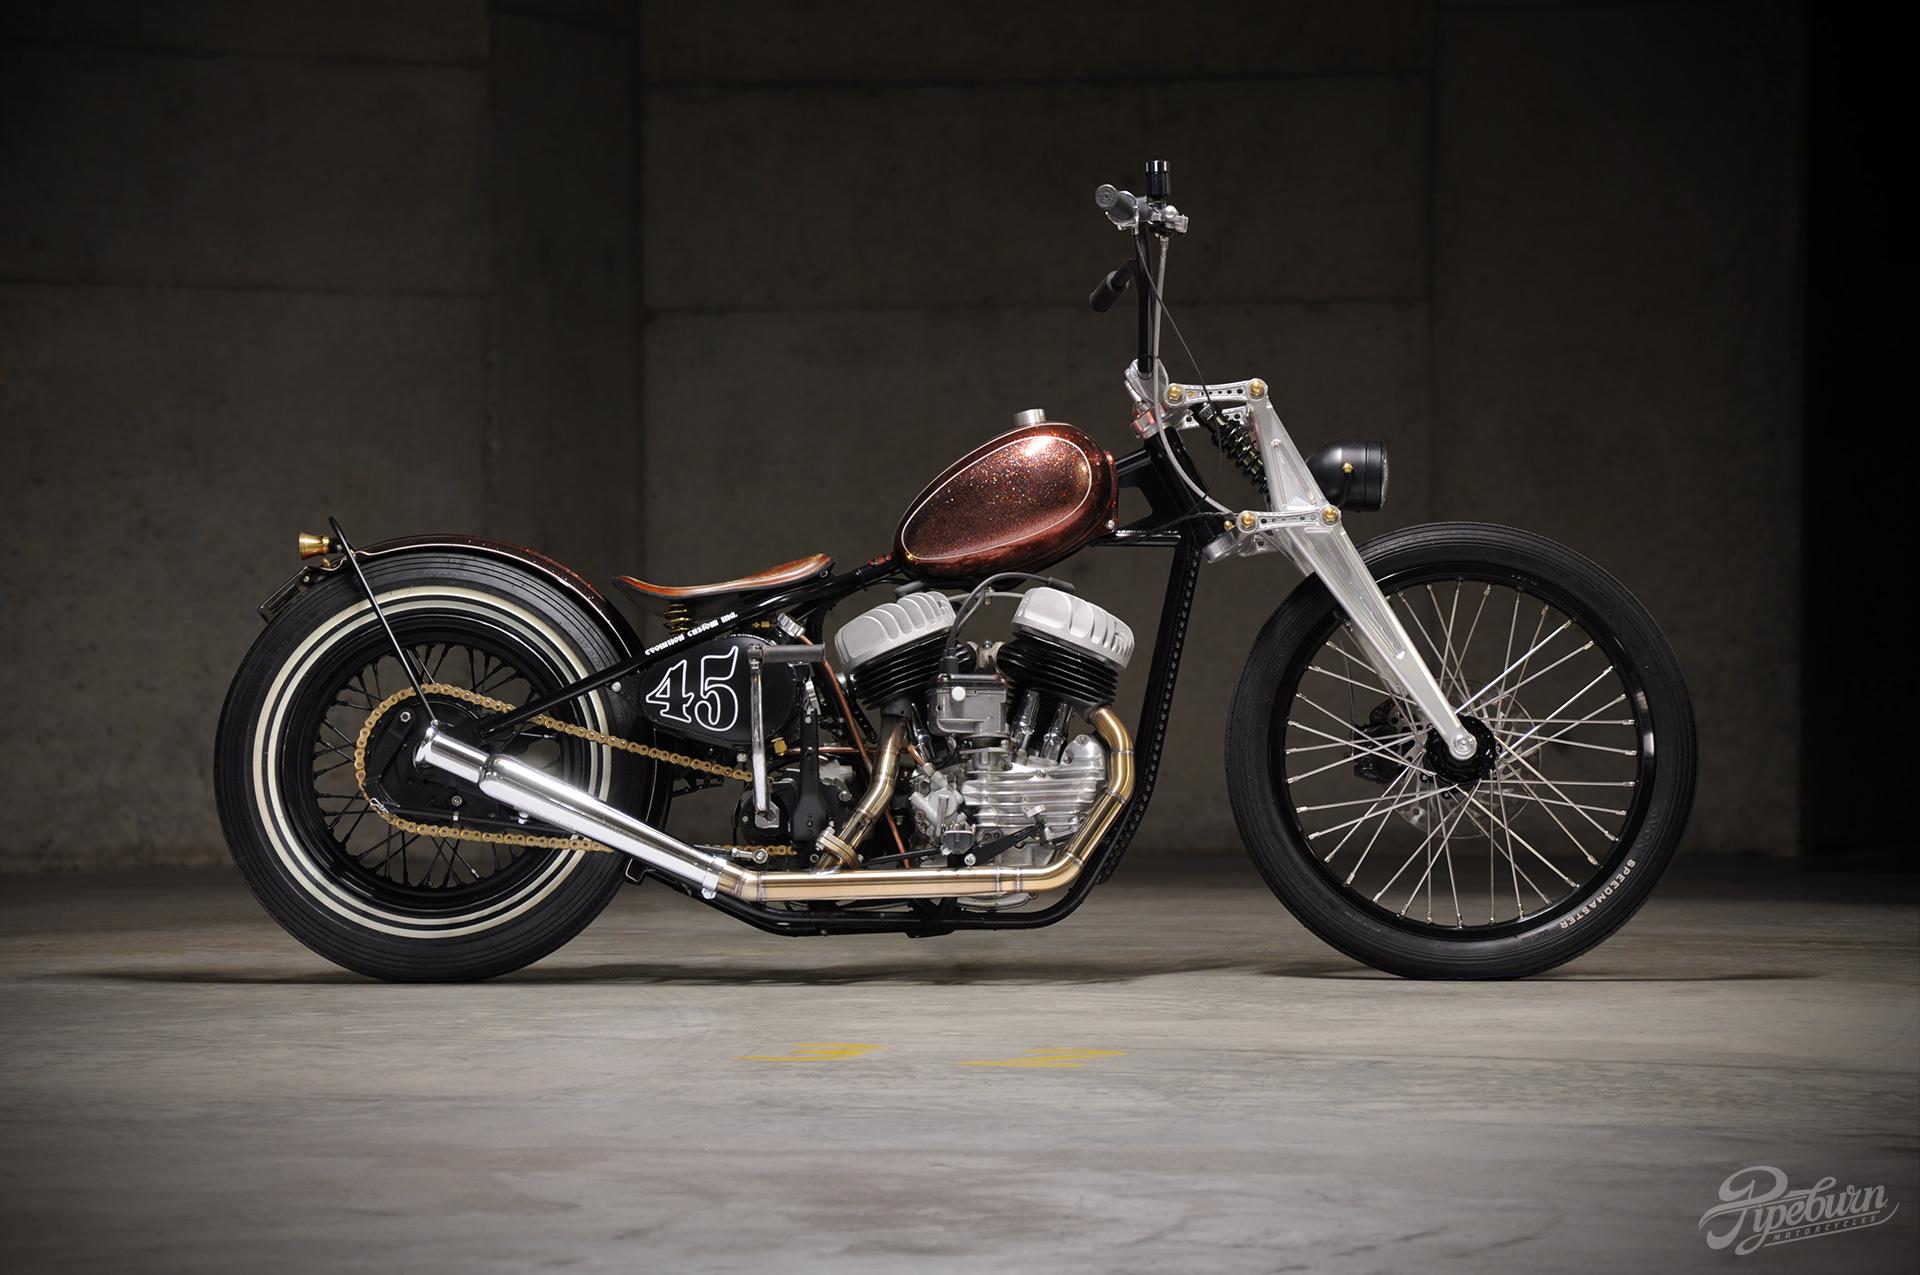 Harley Davidson Wallpaper High Definition 1920x1275